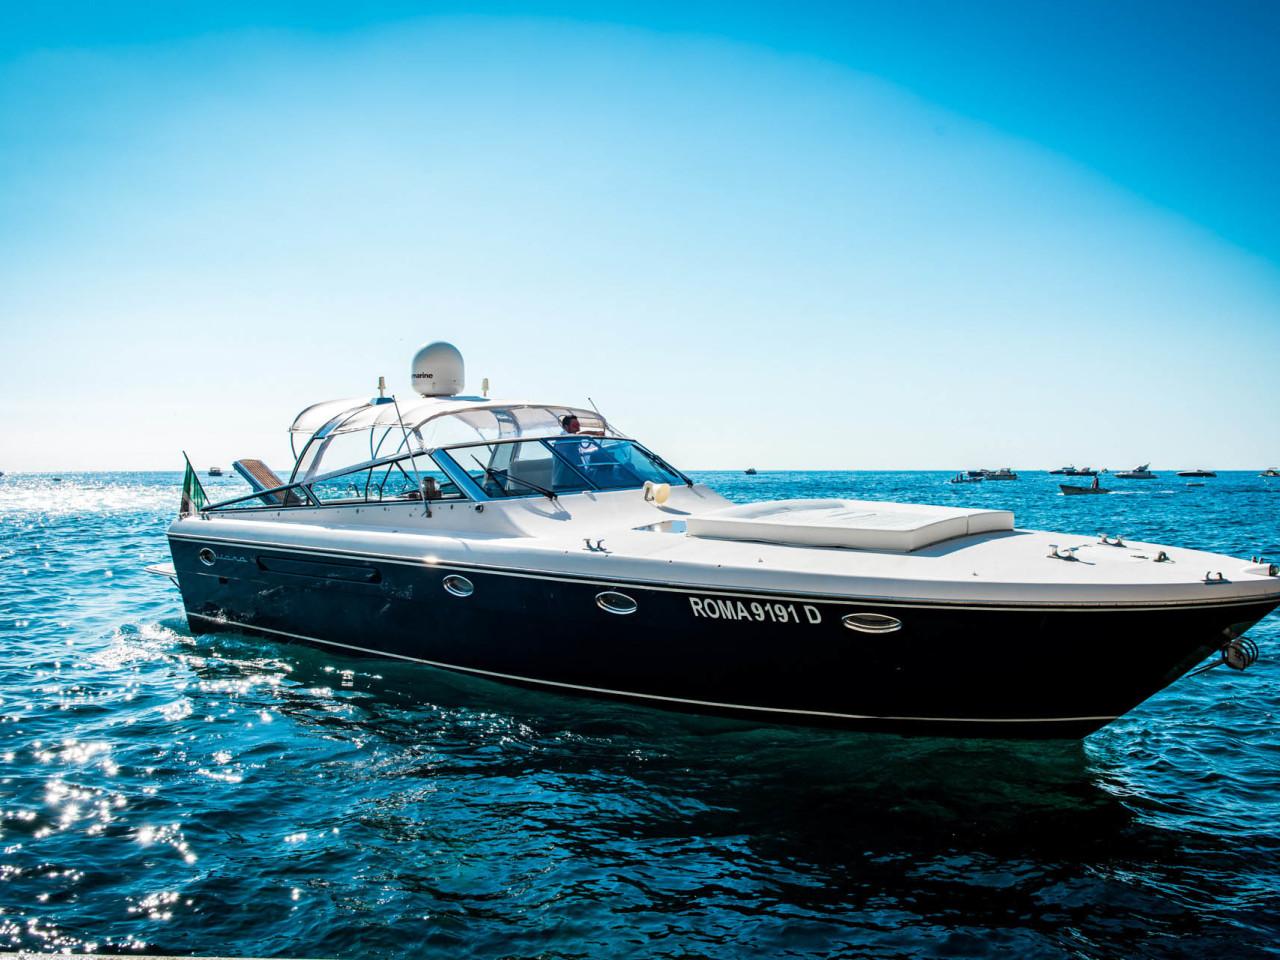 YACHT ITAMA 46| Mar Amar Sorrento boat tour